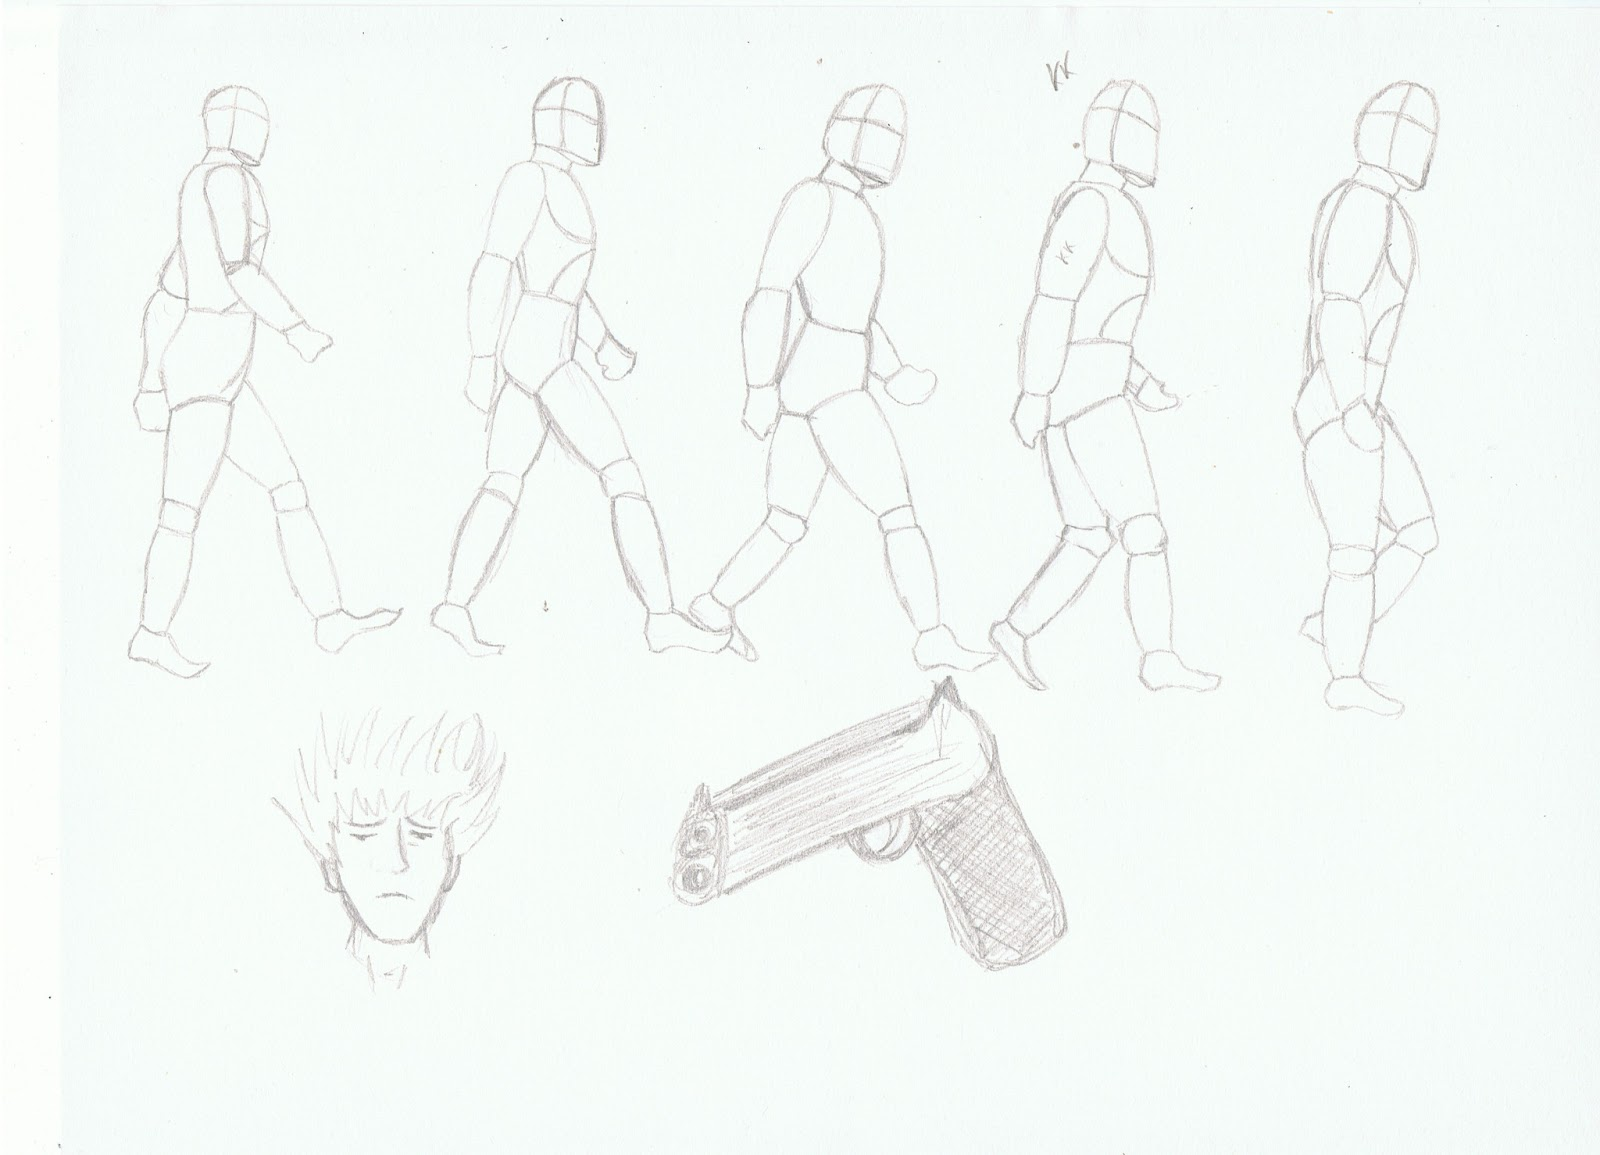 dibu-evolution: febrero 2013